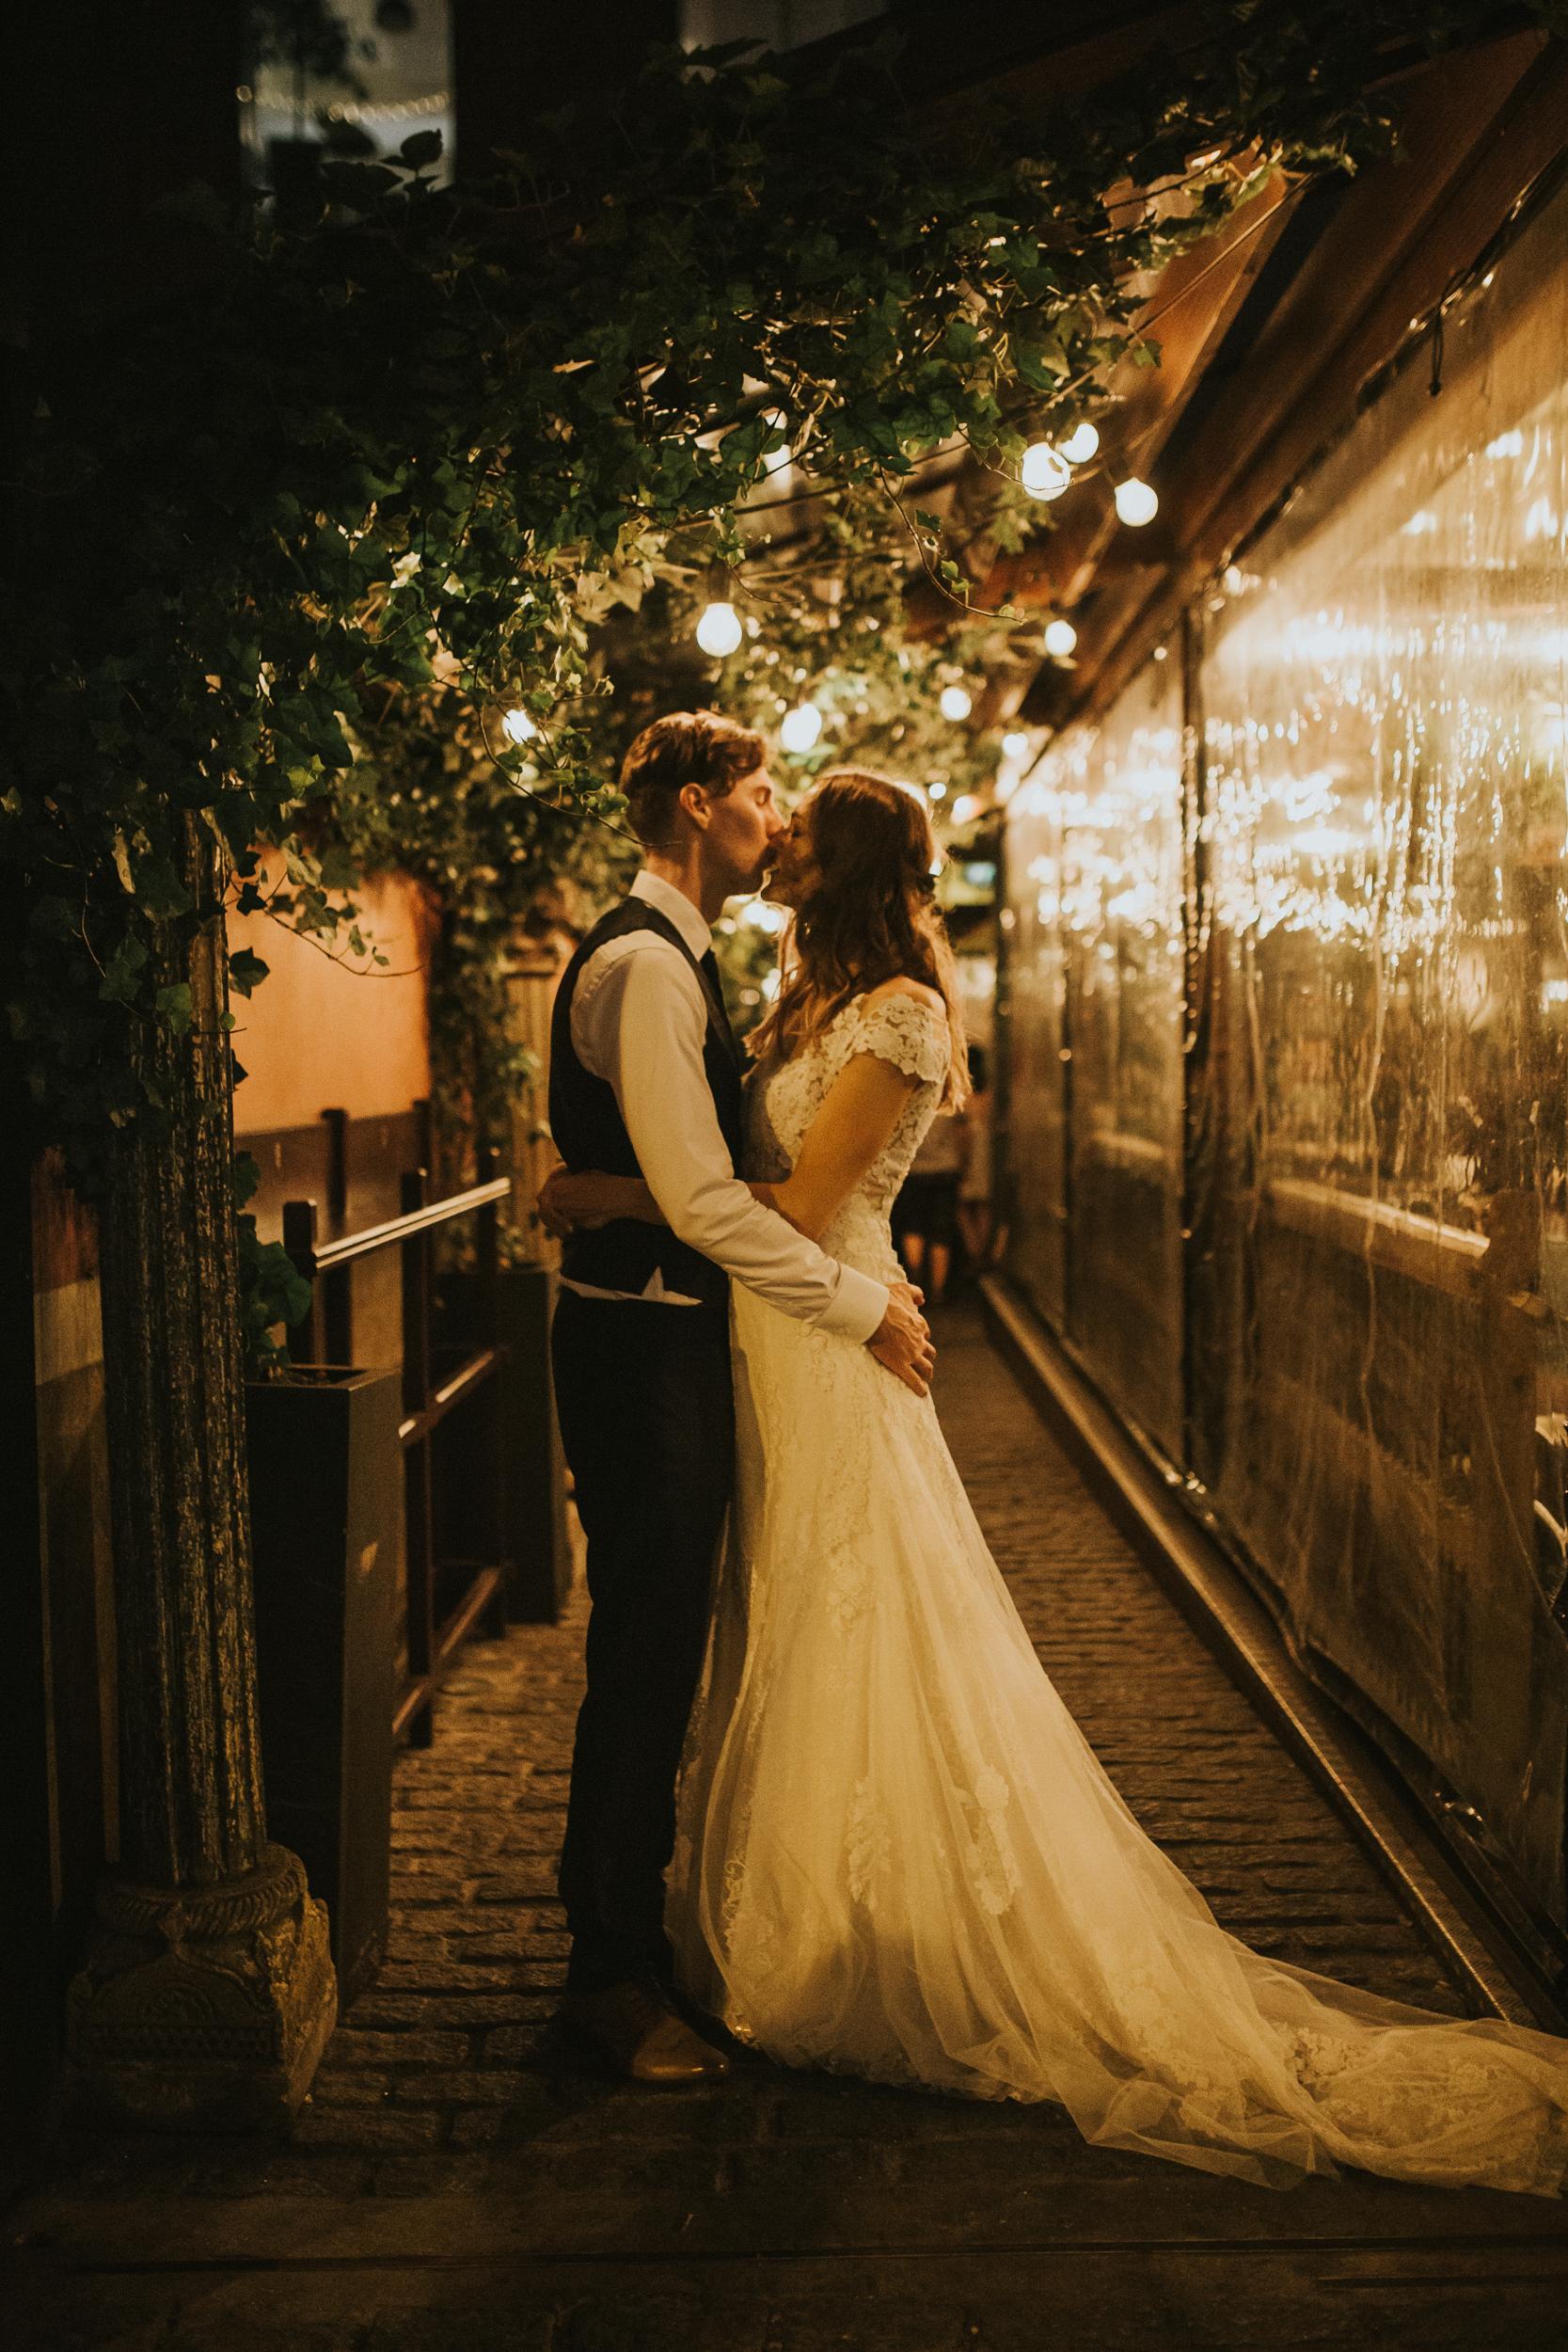 Laura-Benn-The-Asylum-London-The-Ace-Hotel-Wedding-Alternative-Darina-Stoda-Photography-817.jpg